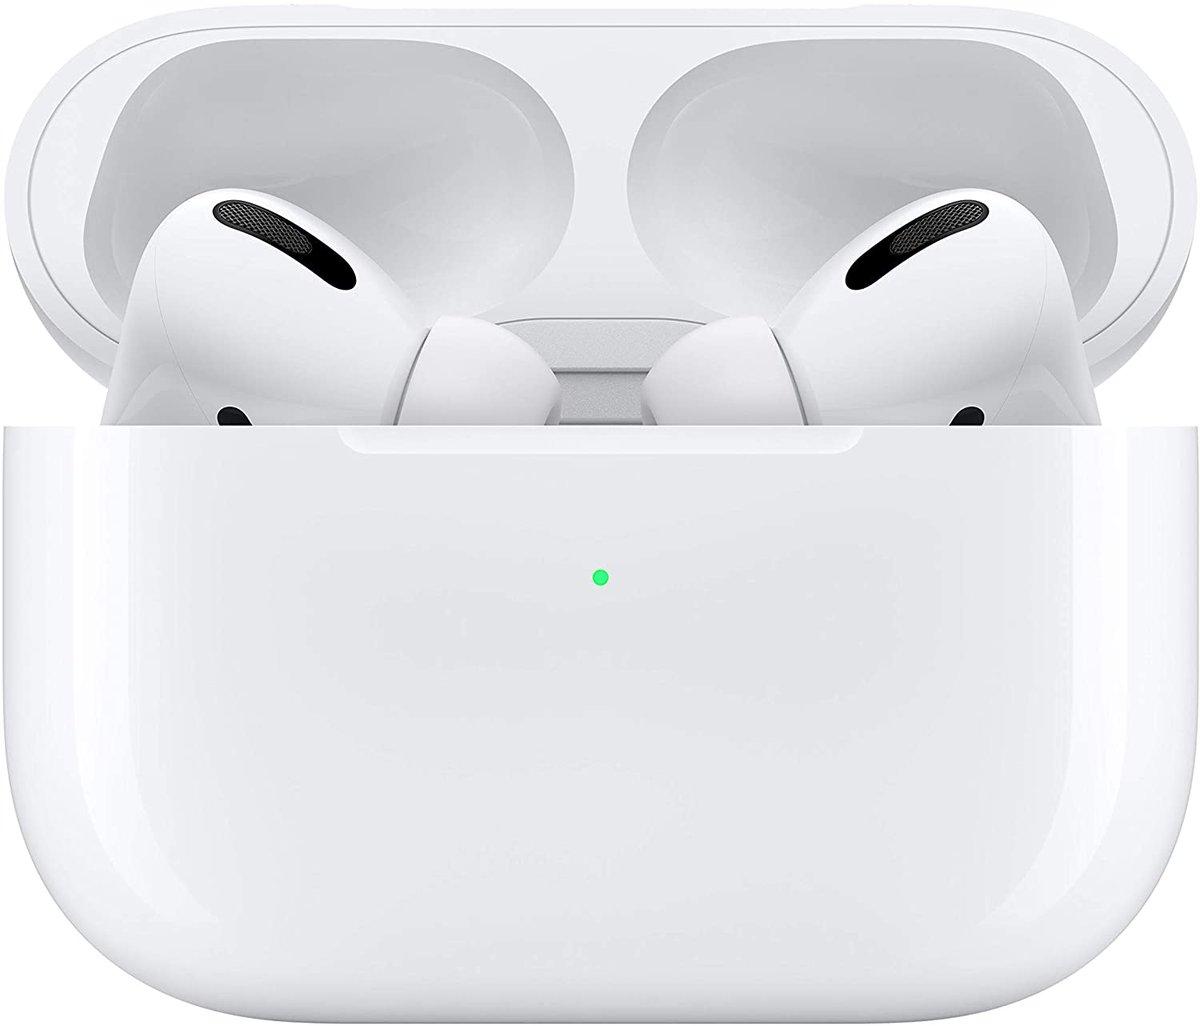 RUN QUICKK!!  NEW Apple Airpods Pros for $219.99!!!  -Under retail, retail $250!!!!!  https://t.co/CWCWdBvvNa https://t.co/wDqQsgU7IF